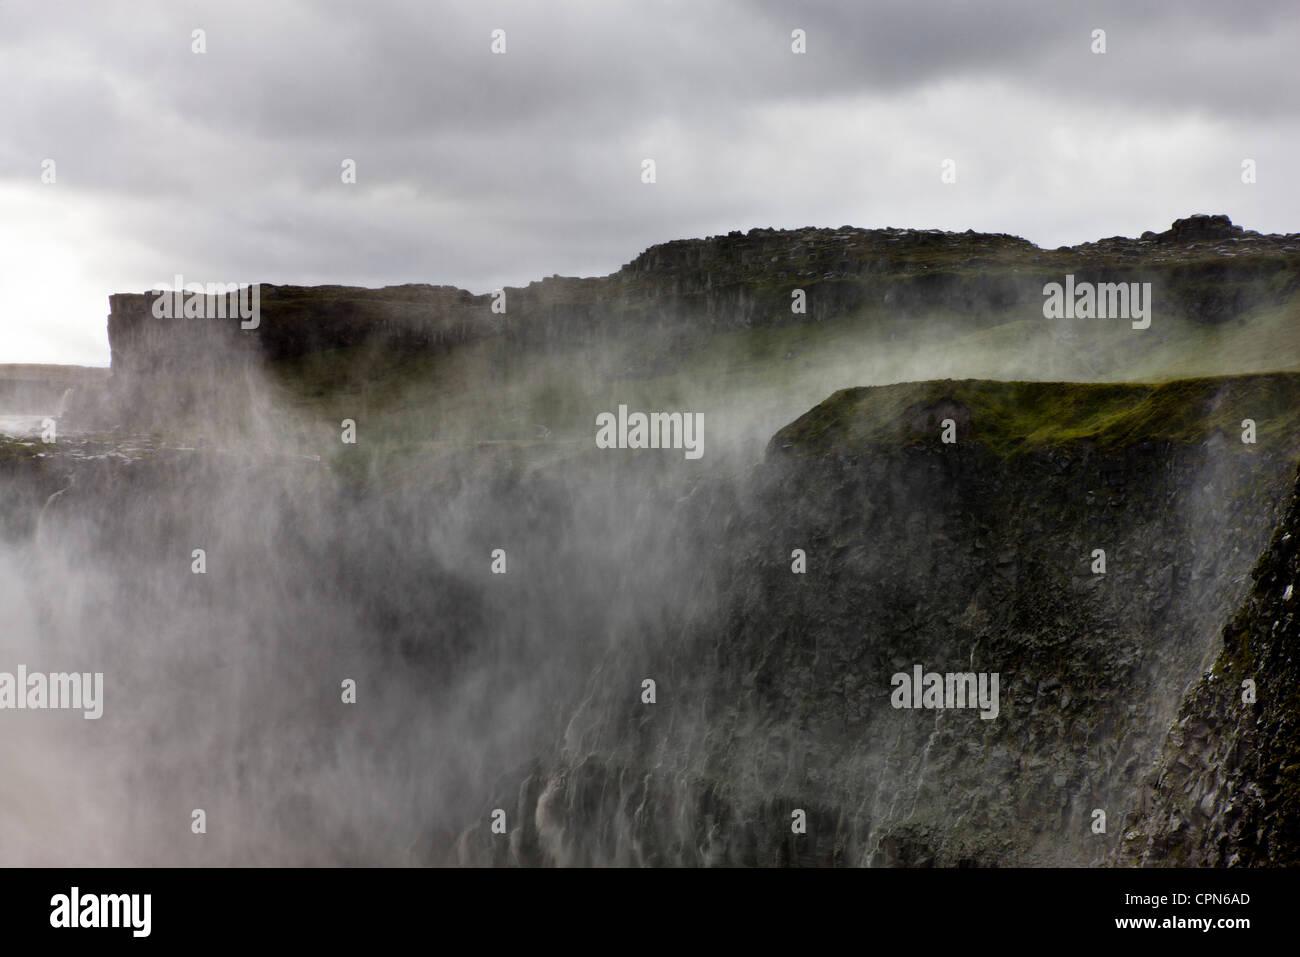 Dettifoss waterfall, Vatnajokull National Park, Iceland - Stock Image